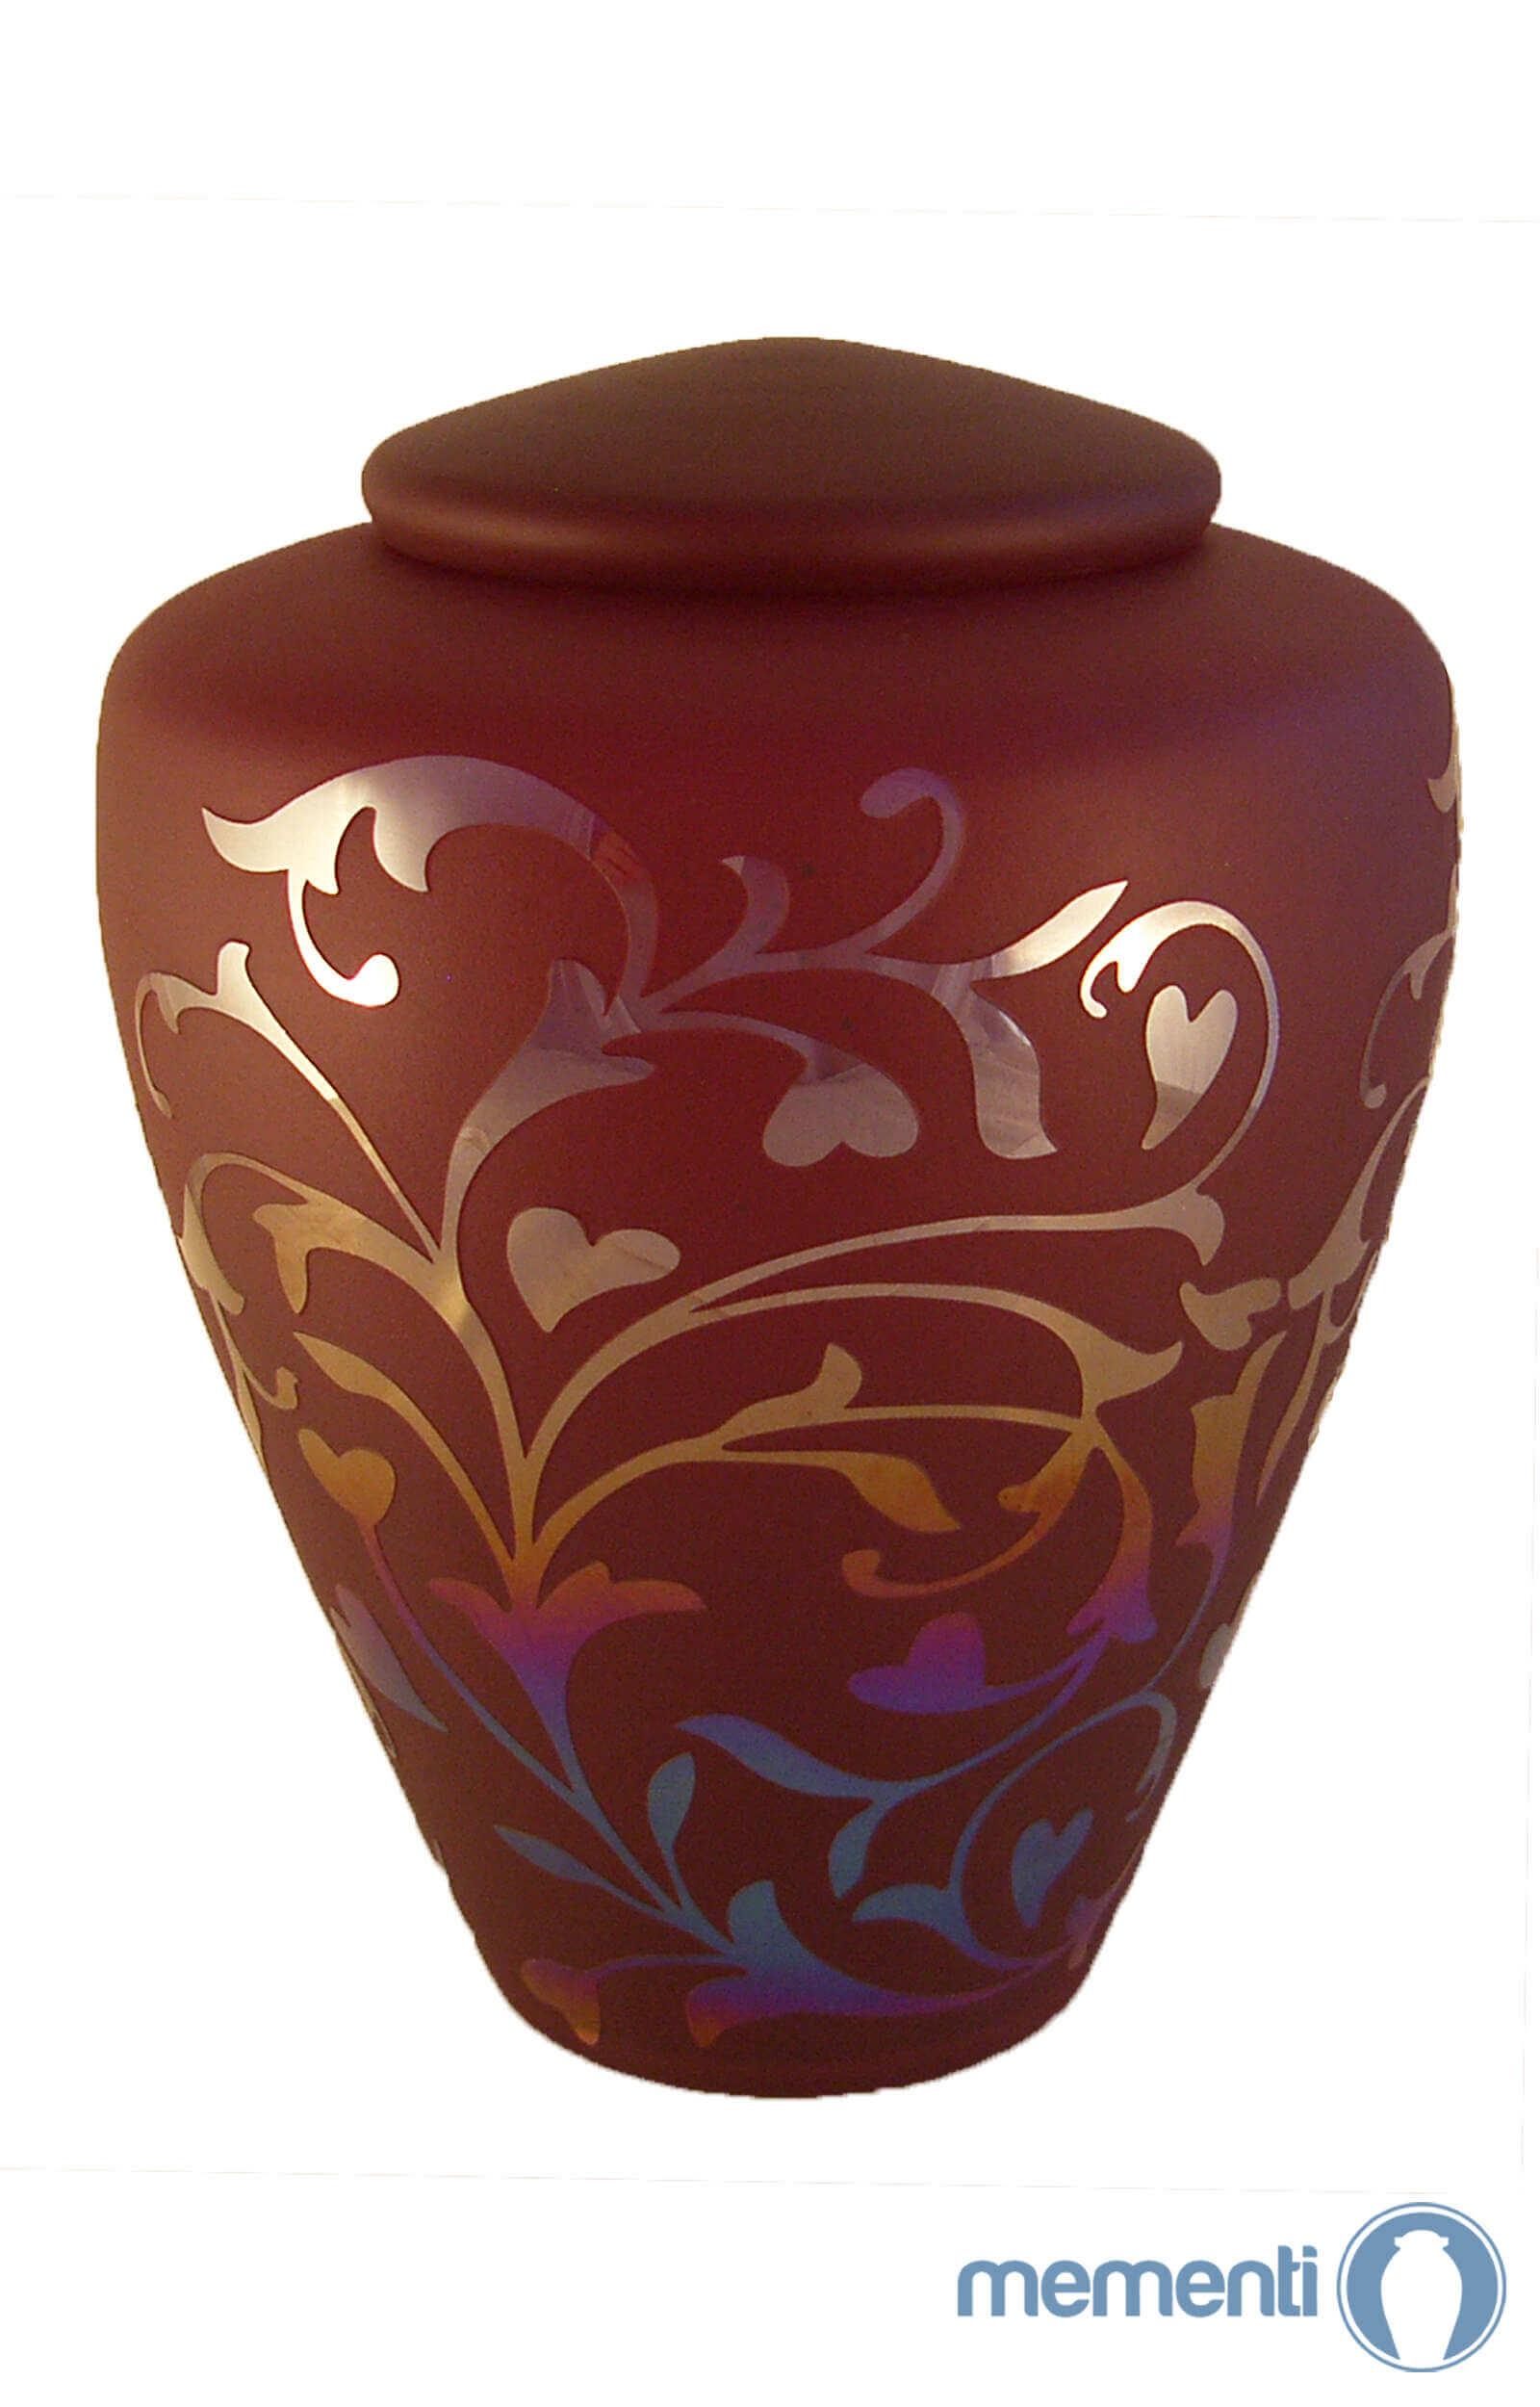 en G02 flourish detailed current red glass urn